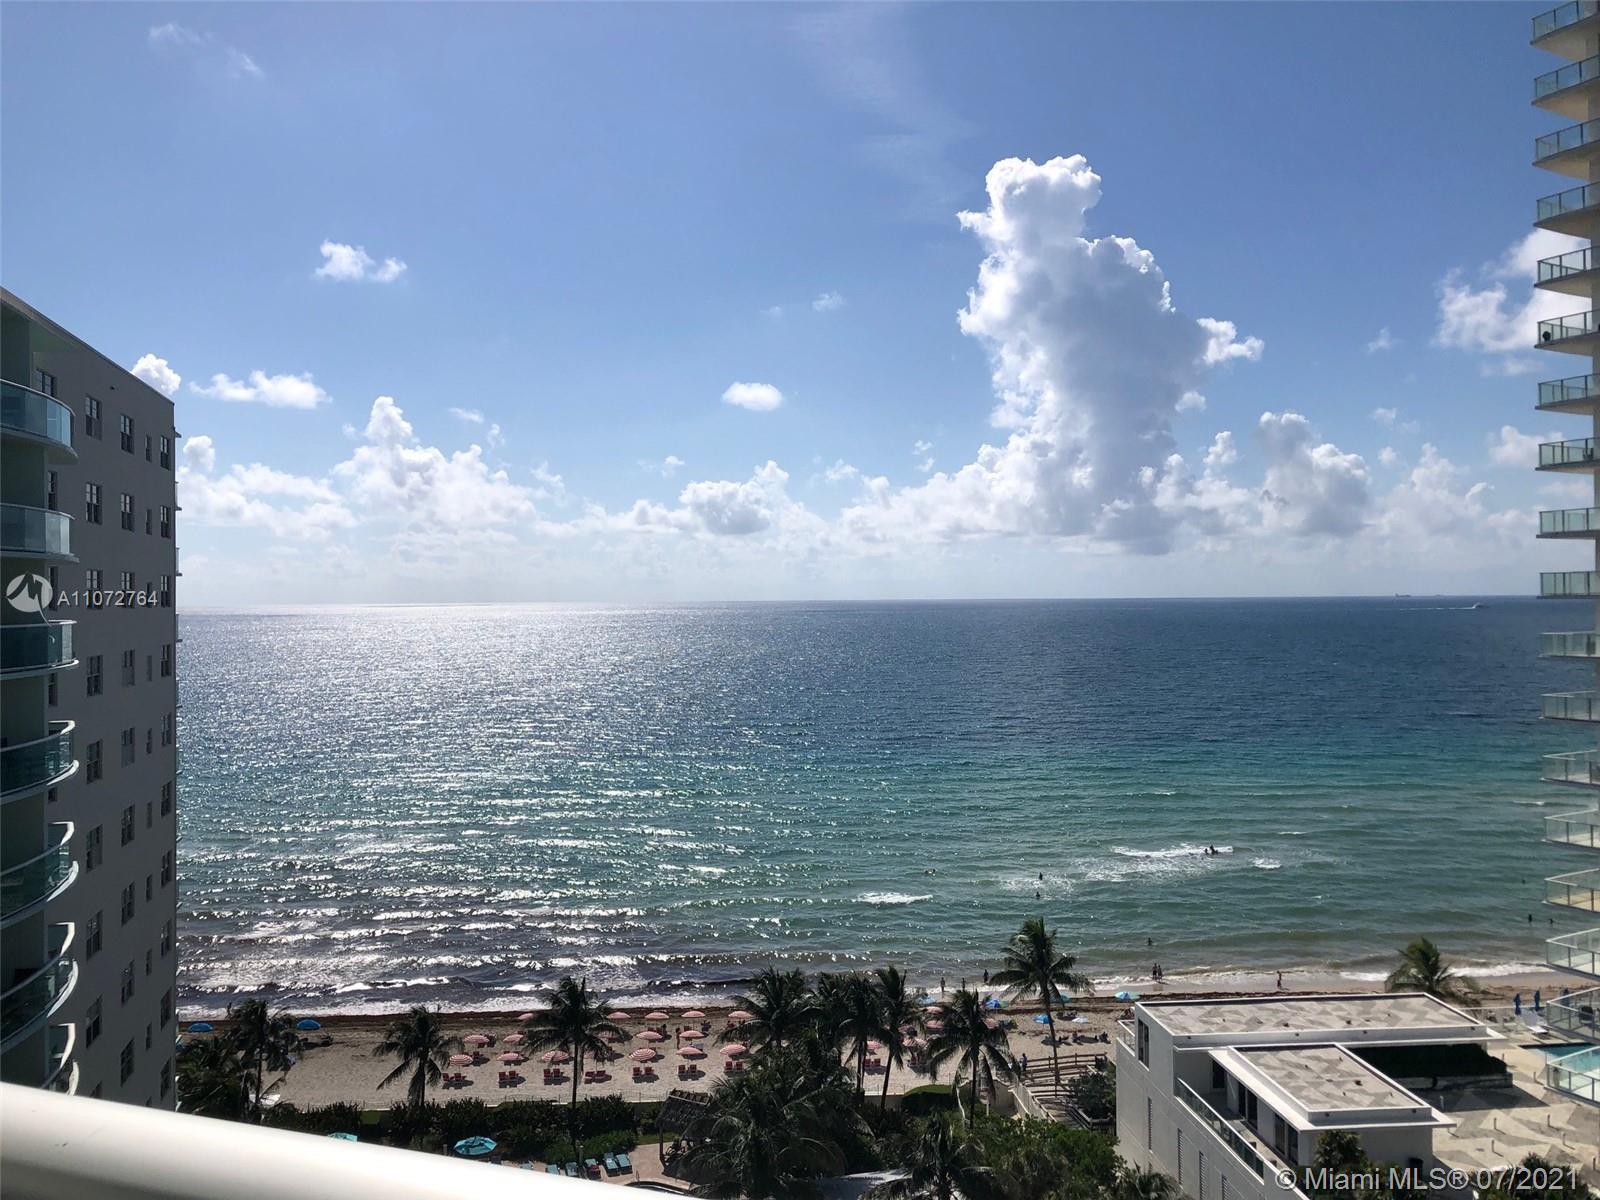 SUPER HOT RESORT LOCATION ON HOLLYWOOD BEACH.1BR/1BA 874SF. 14TH FLOOR.THE BEST  DIRECT EAST OCEAN &